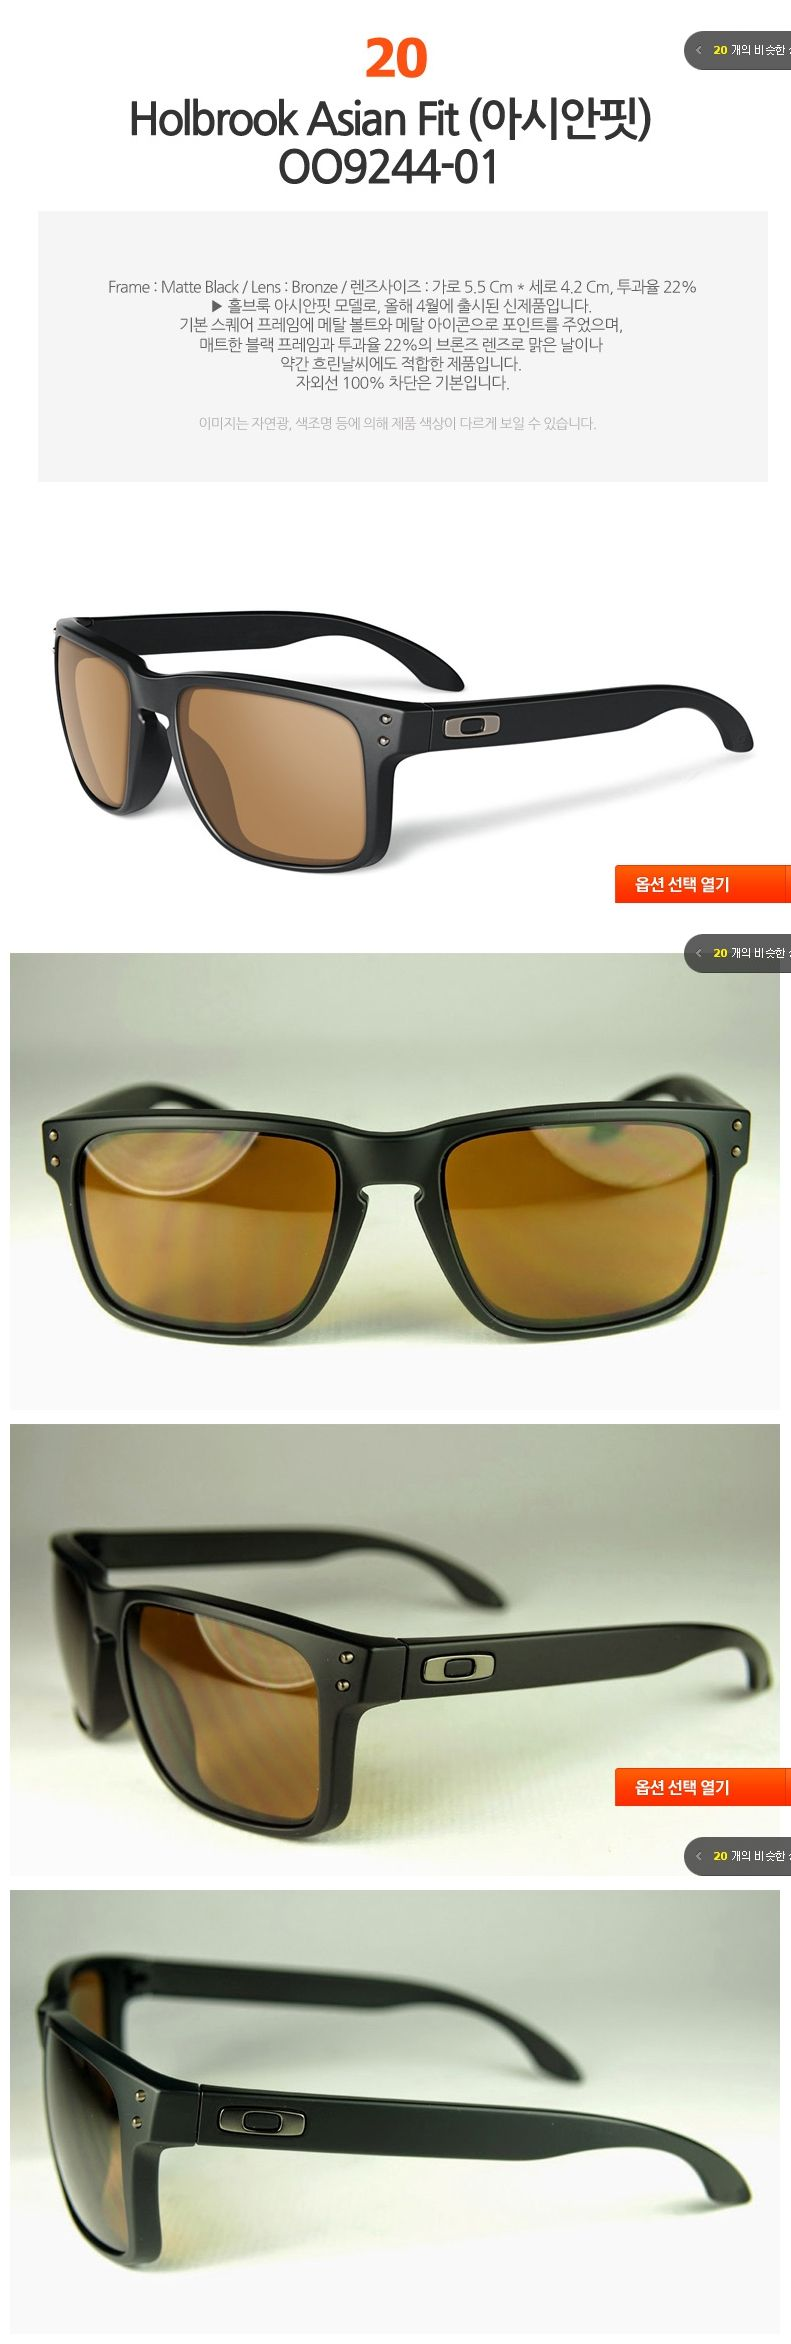 ae9f2d66926 Shop For Mens Designer Sunglasses.  Oakley  Holbrook OO9244-01 (full Image)